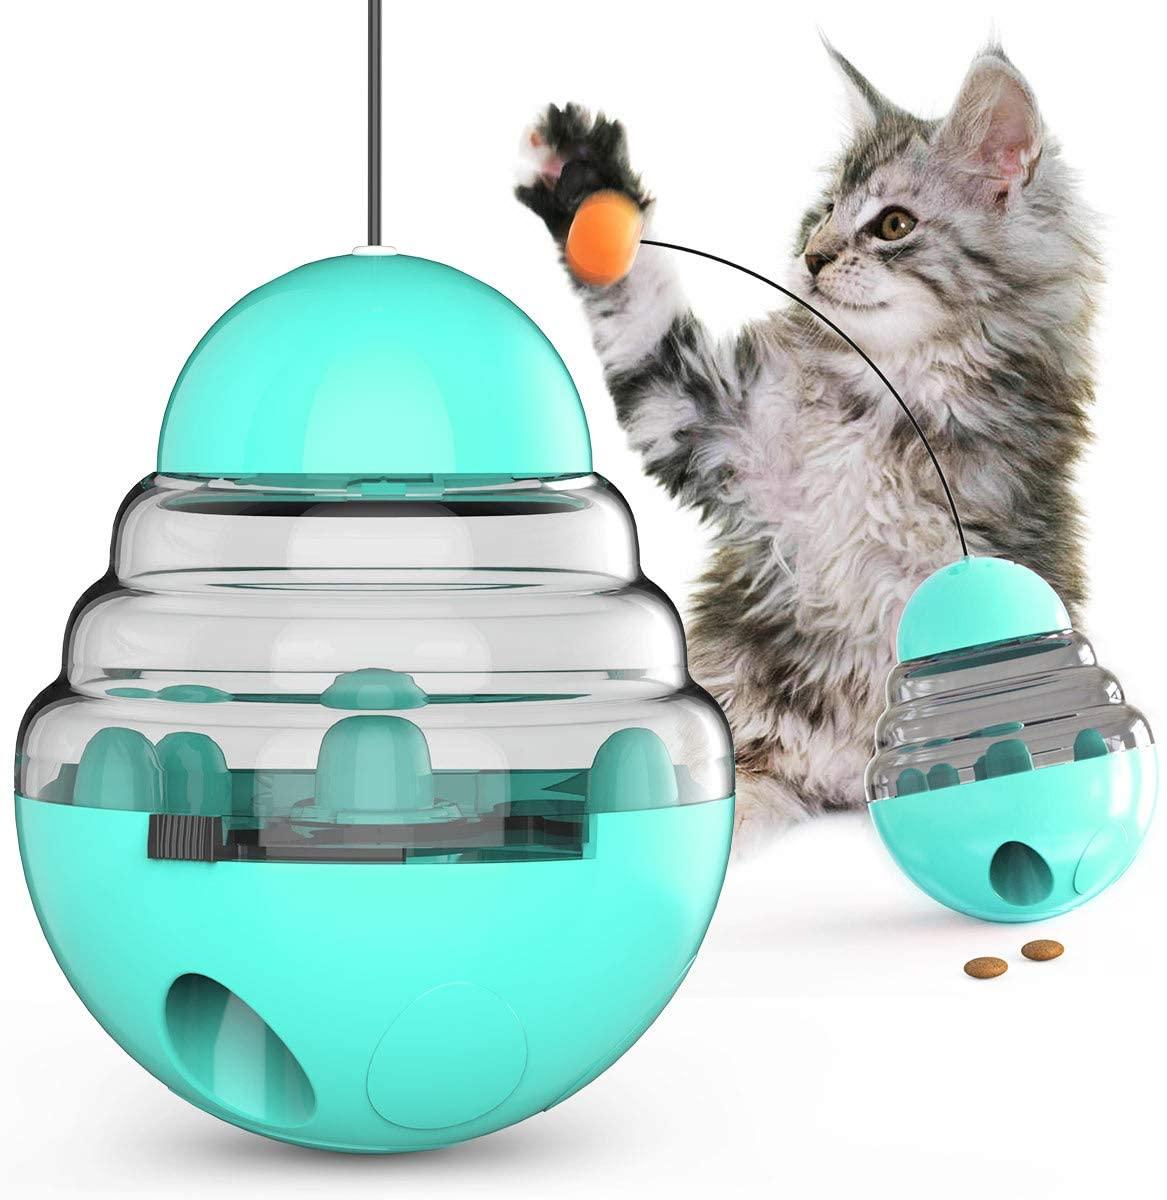 JOYPET Cat Tumbler Treat Ball Toy Interactive Cat Toys Pet Food Dispenser Puzzle Toy Slow Feeder Ball